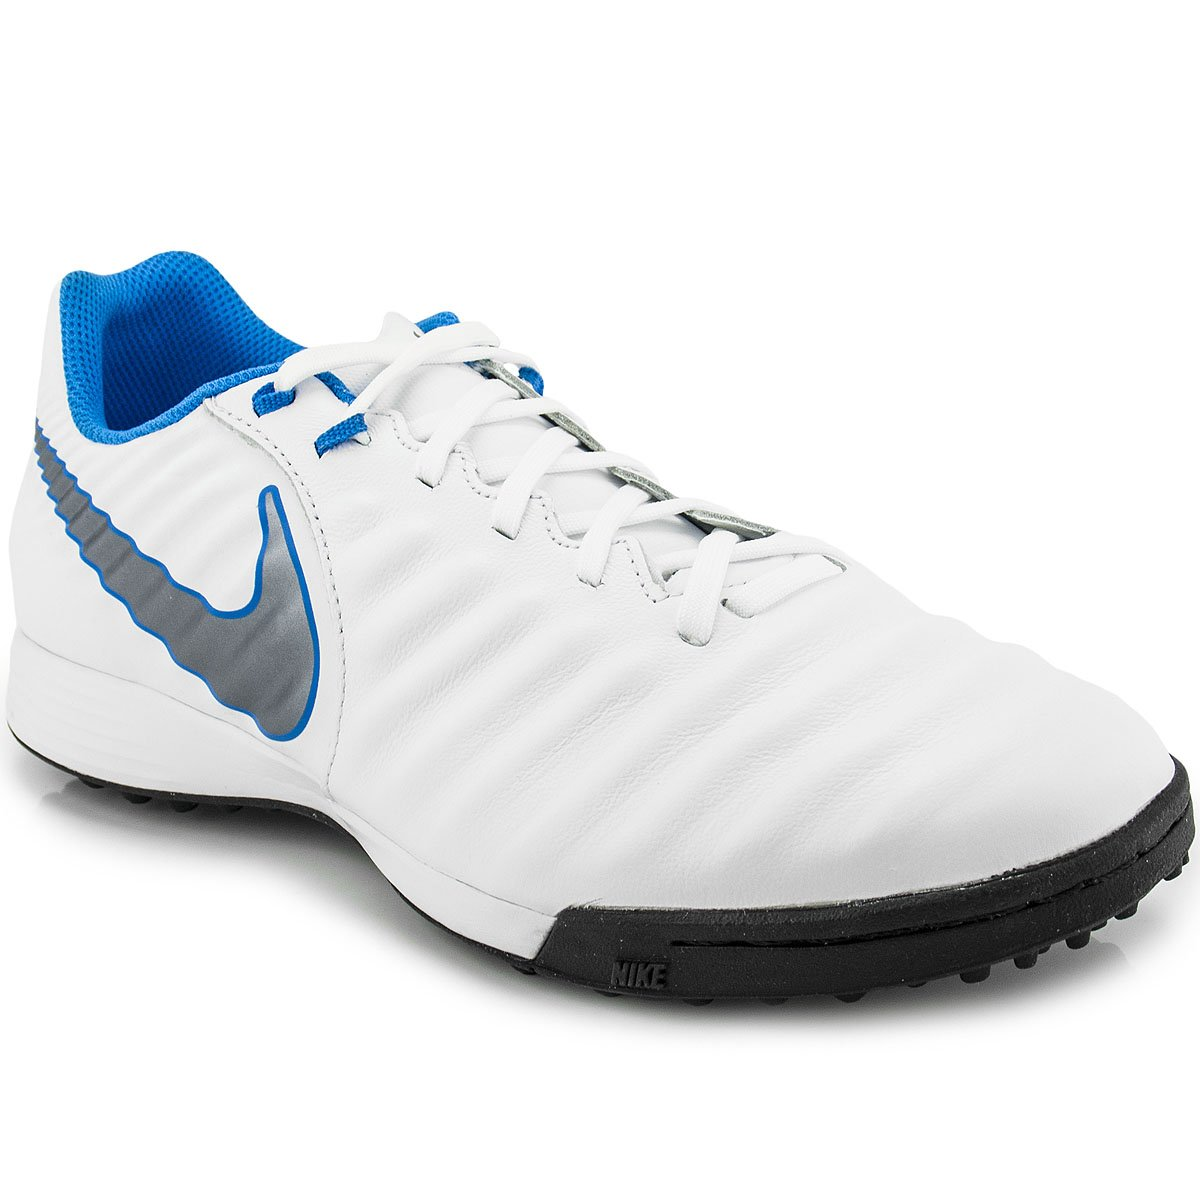 c5cc611a37 Chuteira Nike Tiempo Legendx 7 Academy TF